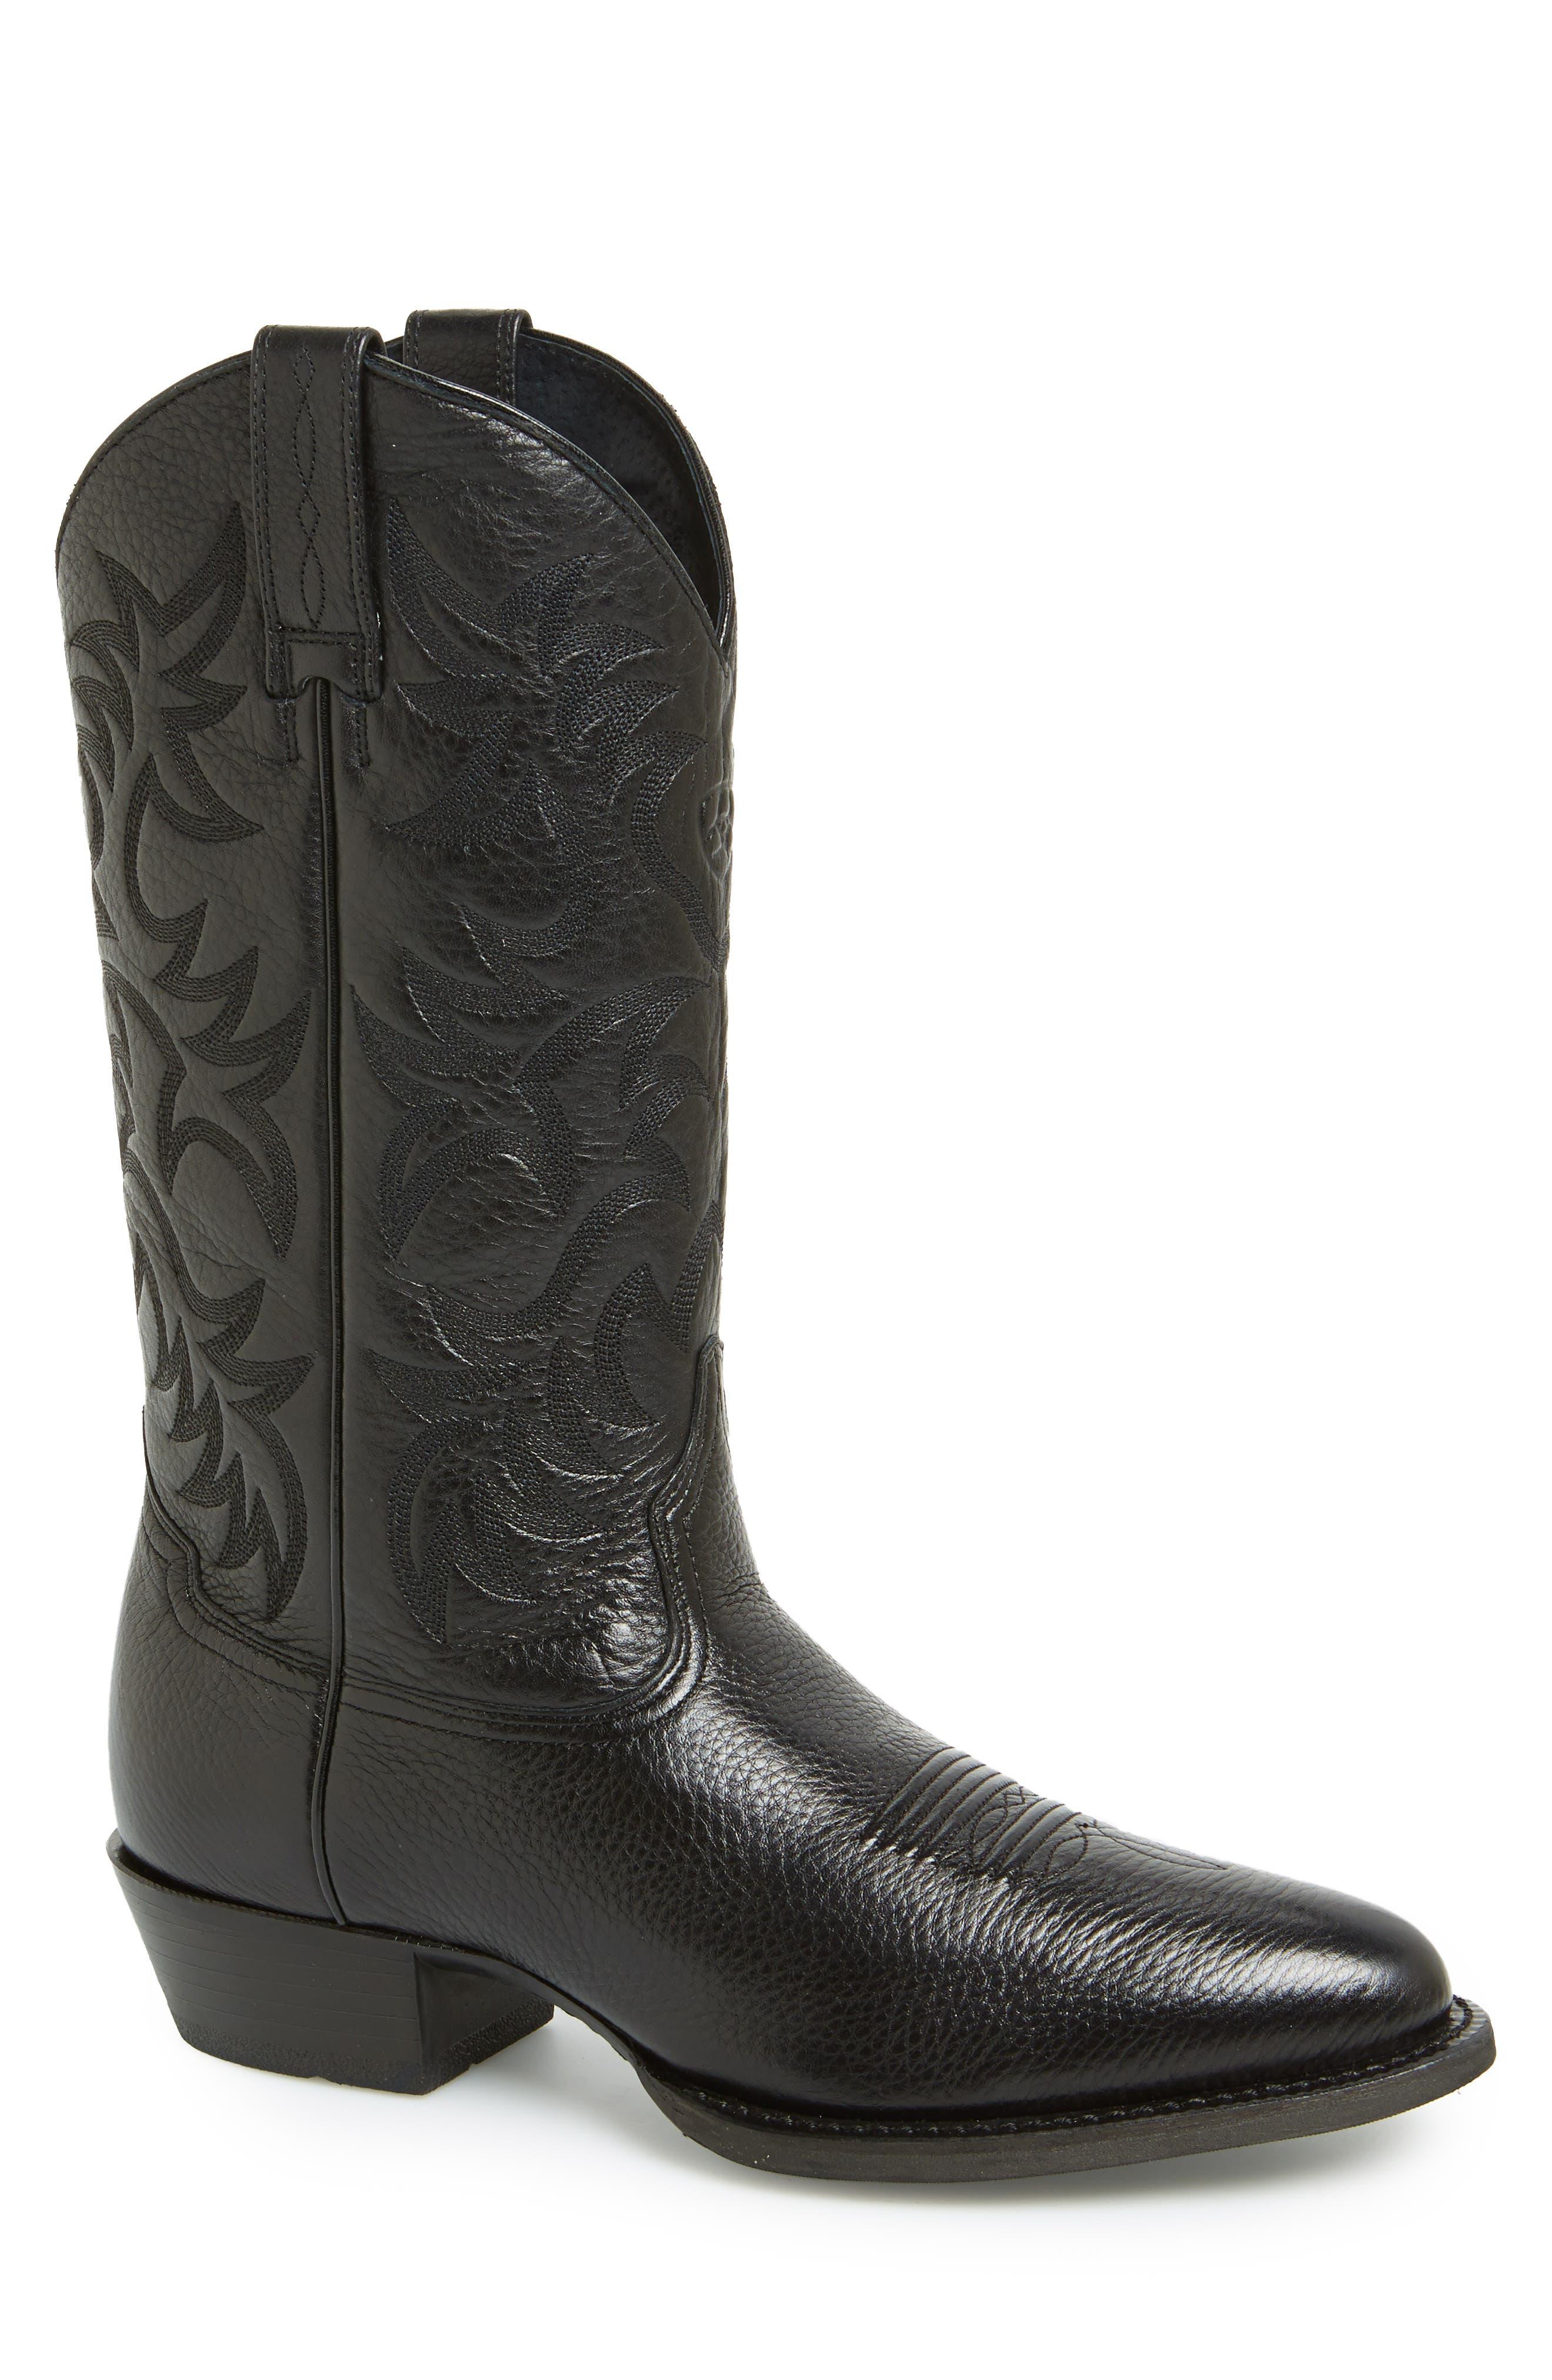 'Heritage' Leather Cowboy R-Toe Boot,                             Alternate thumbnail 4, color,                             BLACK DEERTAN